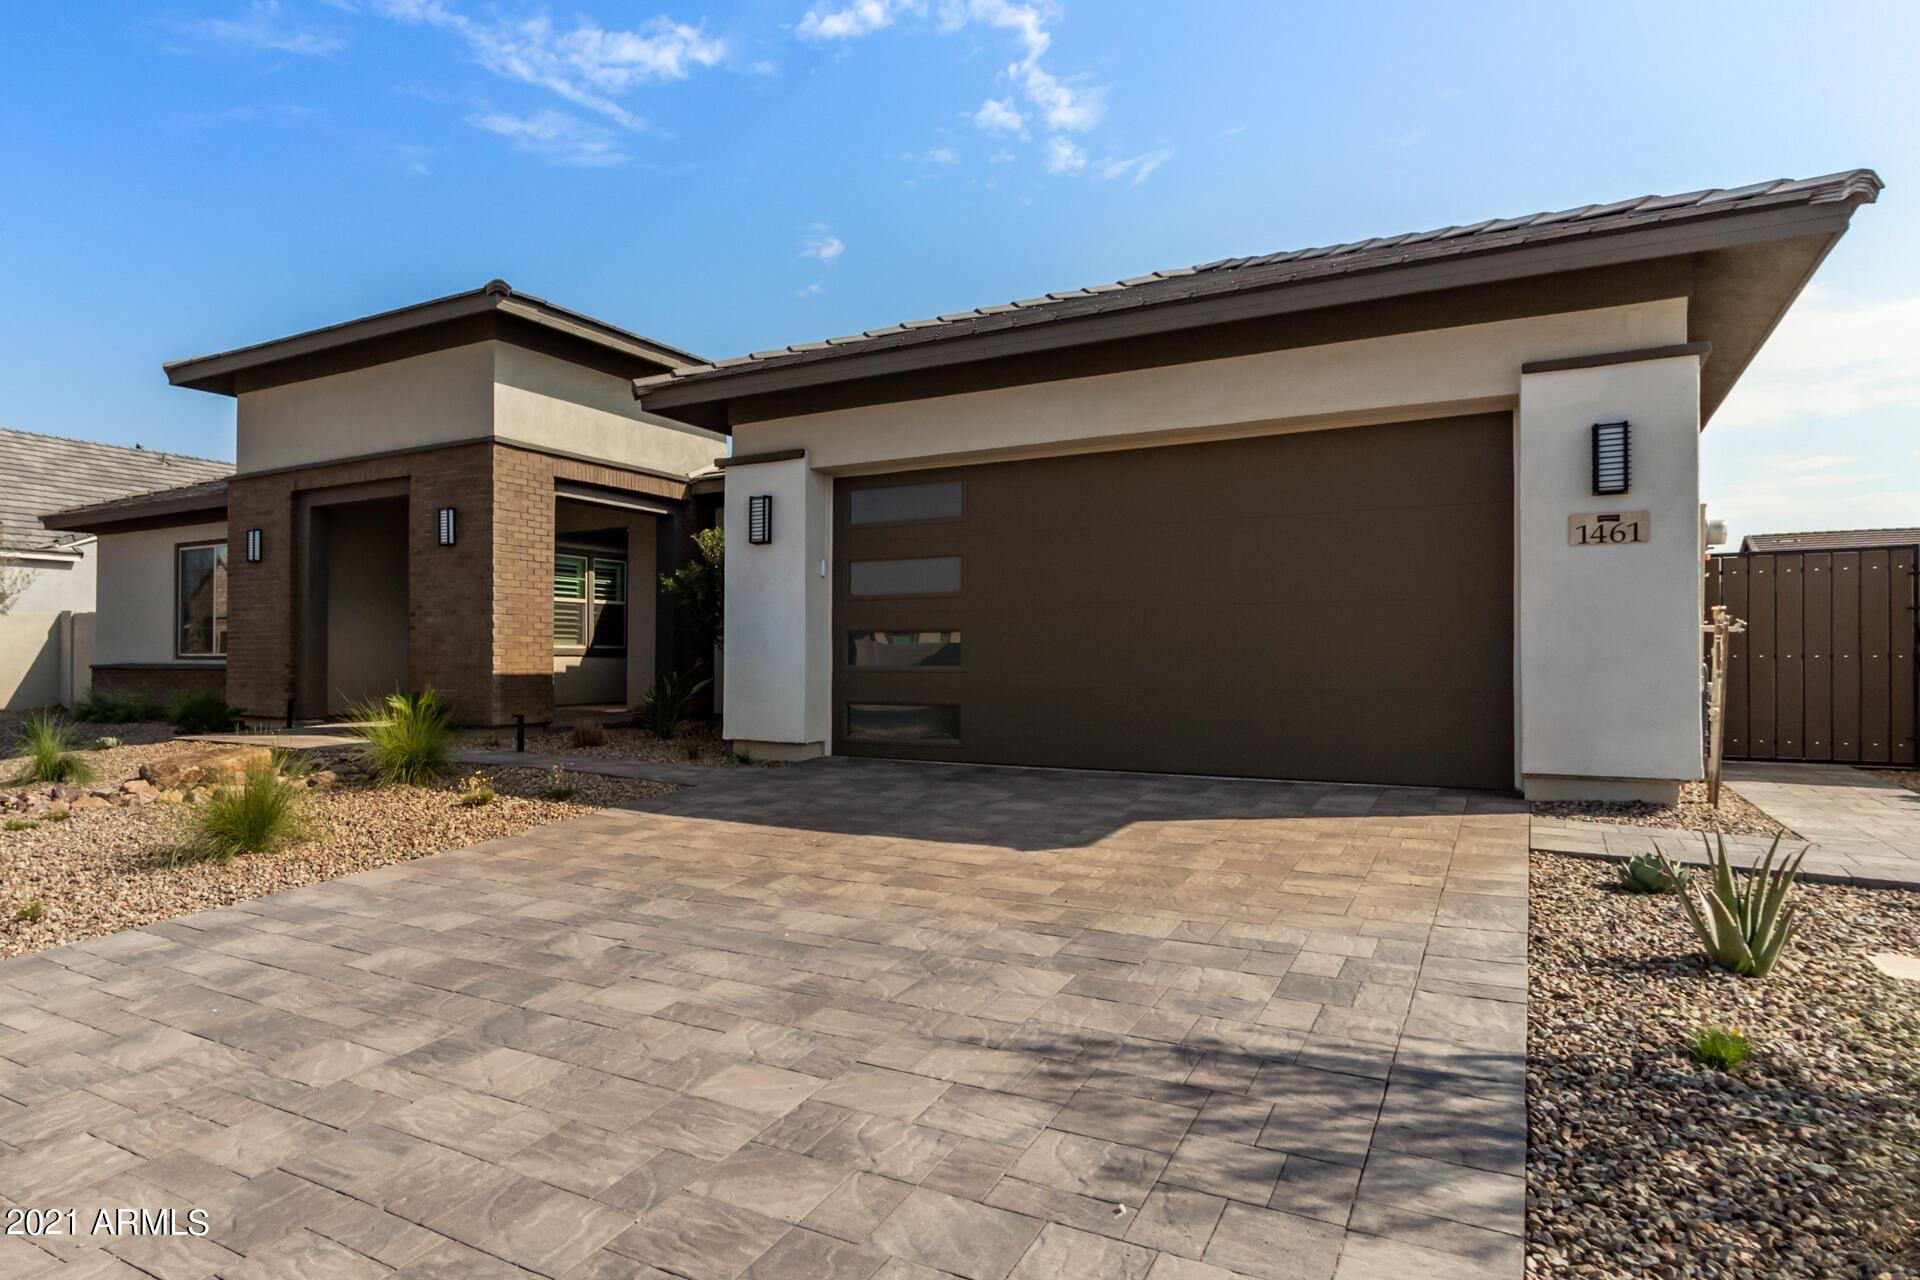 Photo of 1461 E ARIS Drive, Gilbert, AZ 85298 (MLS # 6295881)